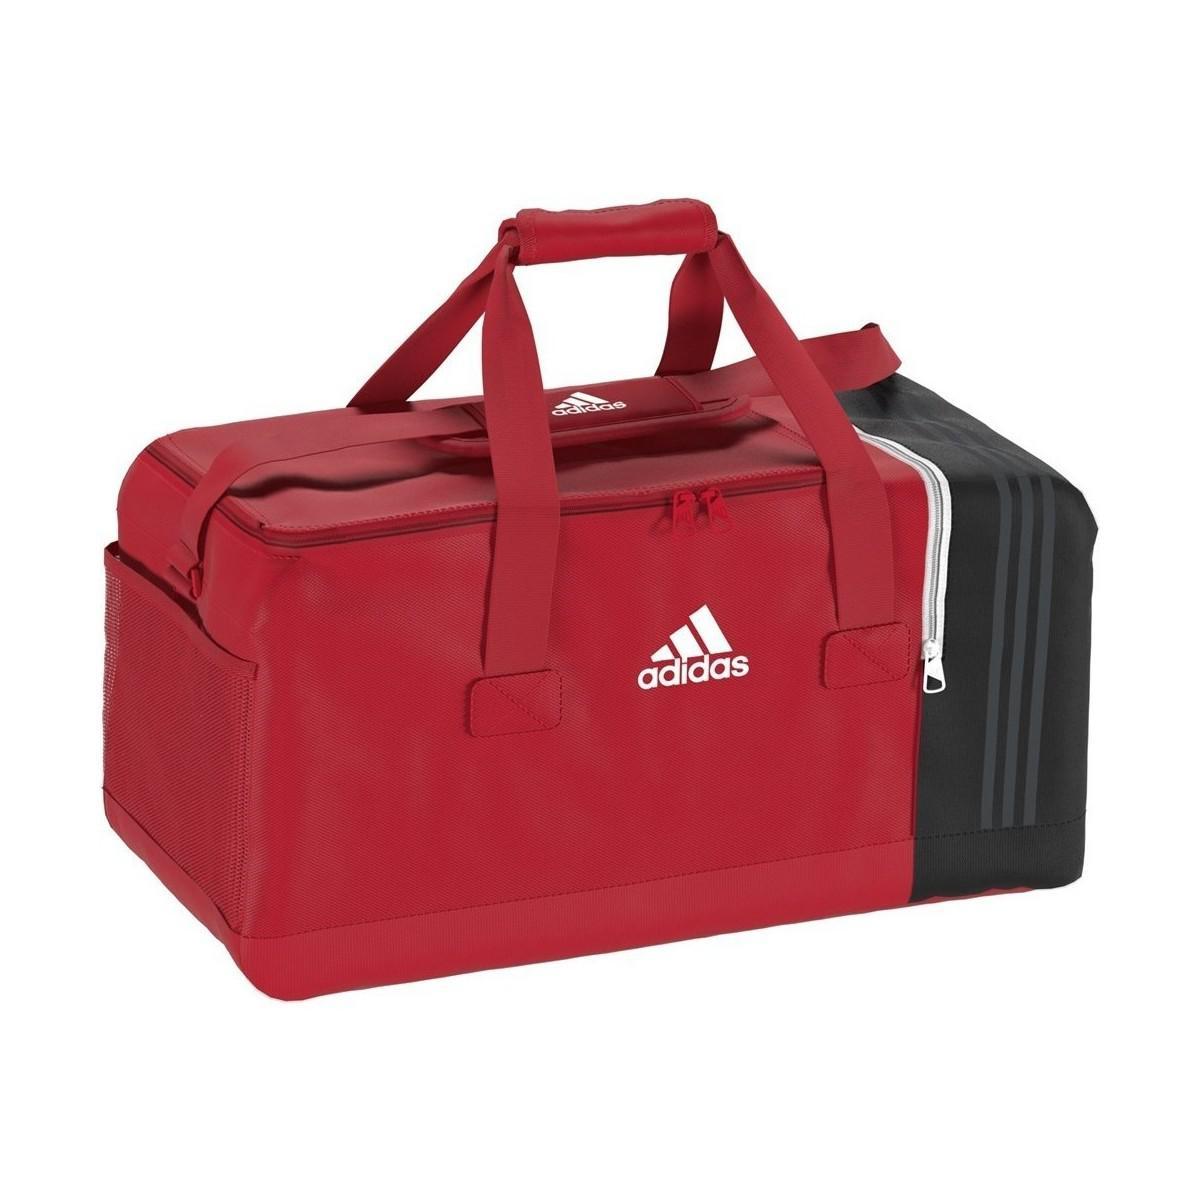 0521bf7724 Adidas - Tiro Medium Men s Bag In Black - Lyst. View fullscreen